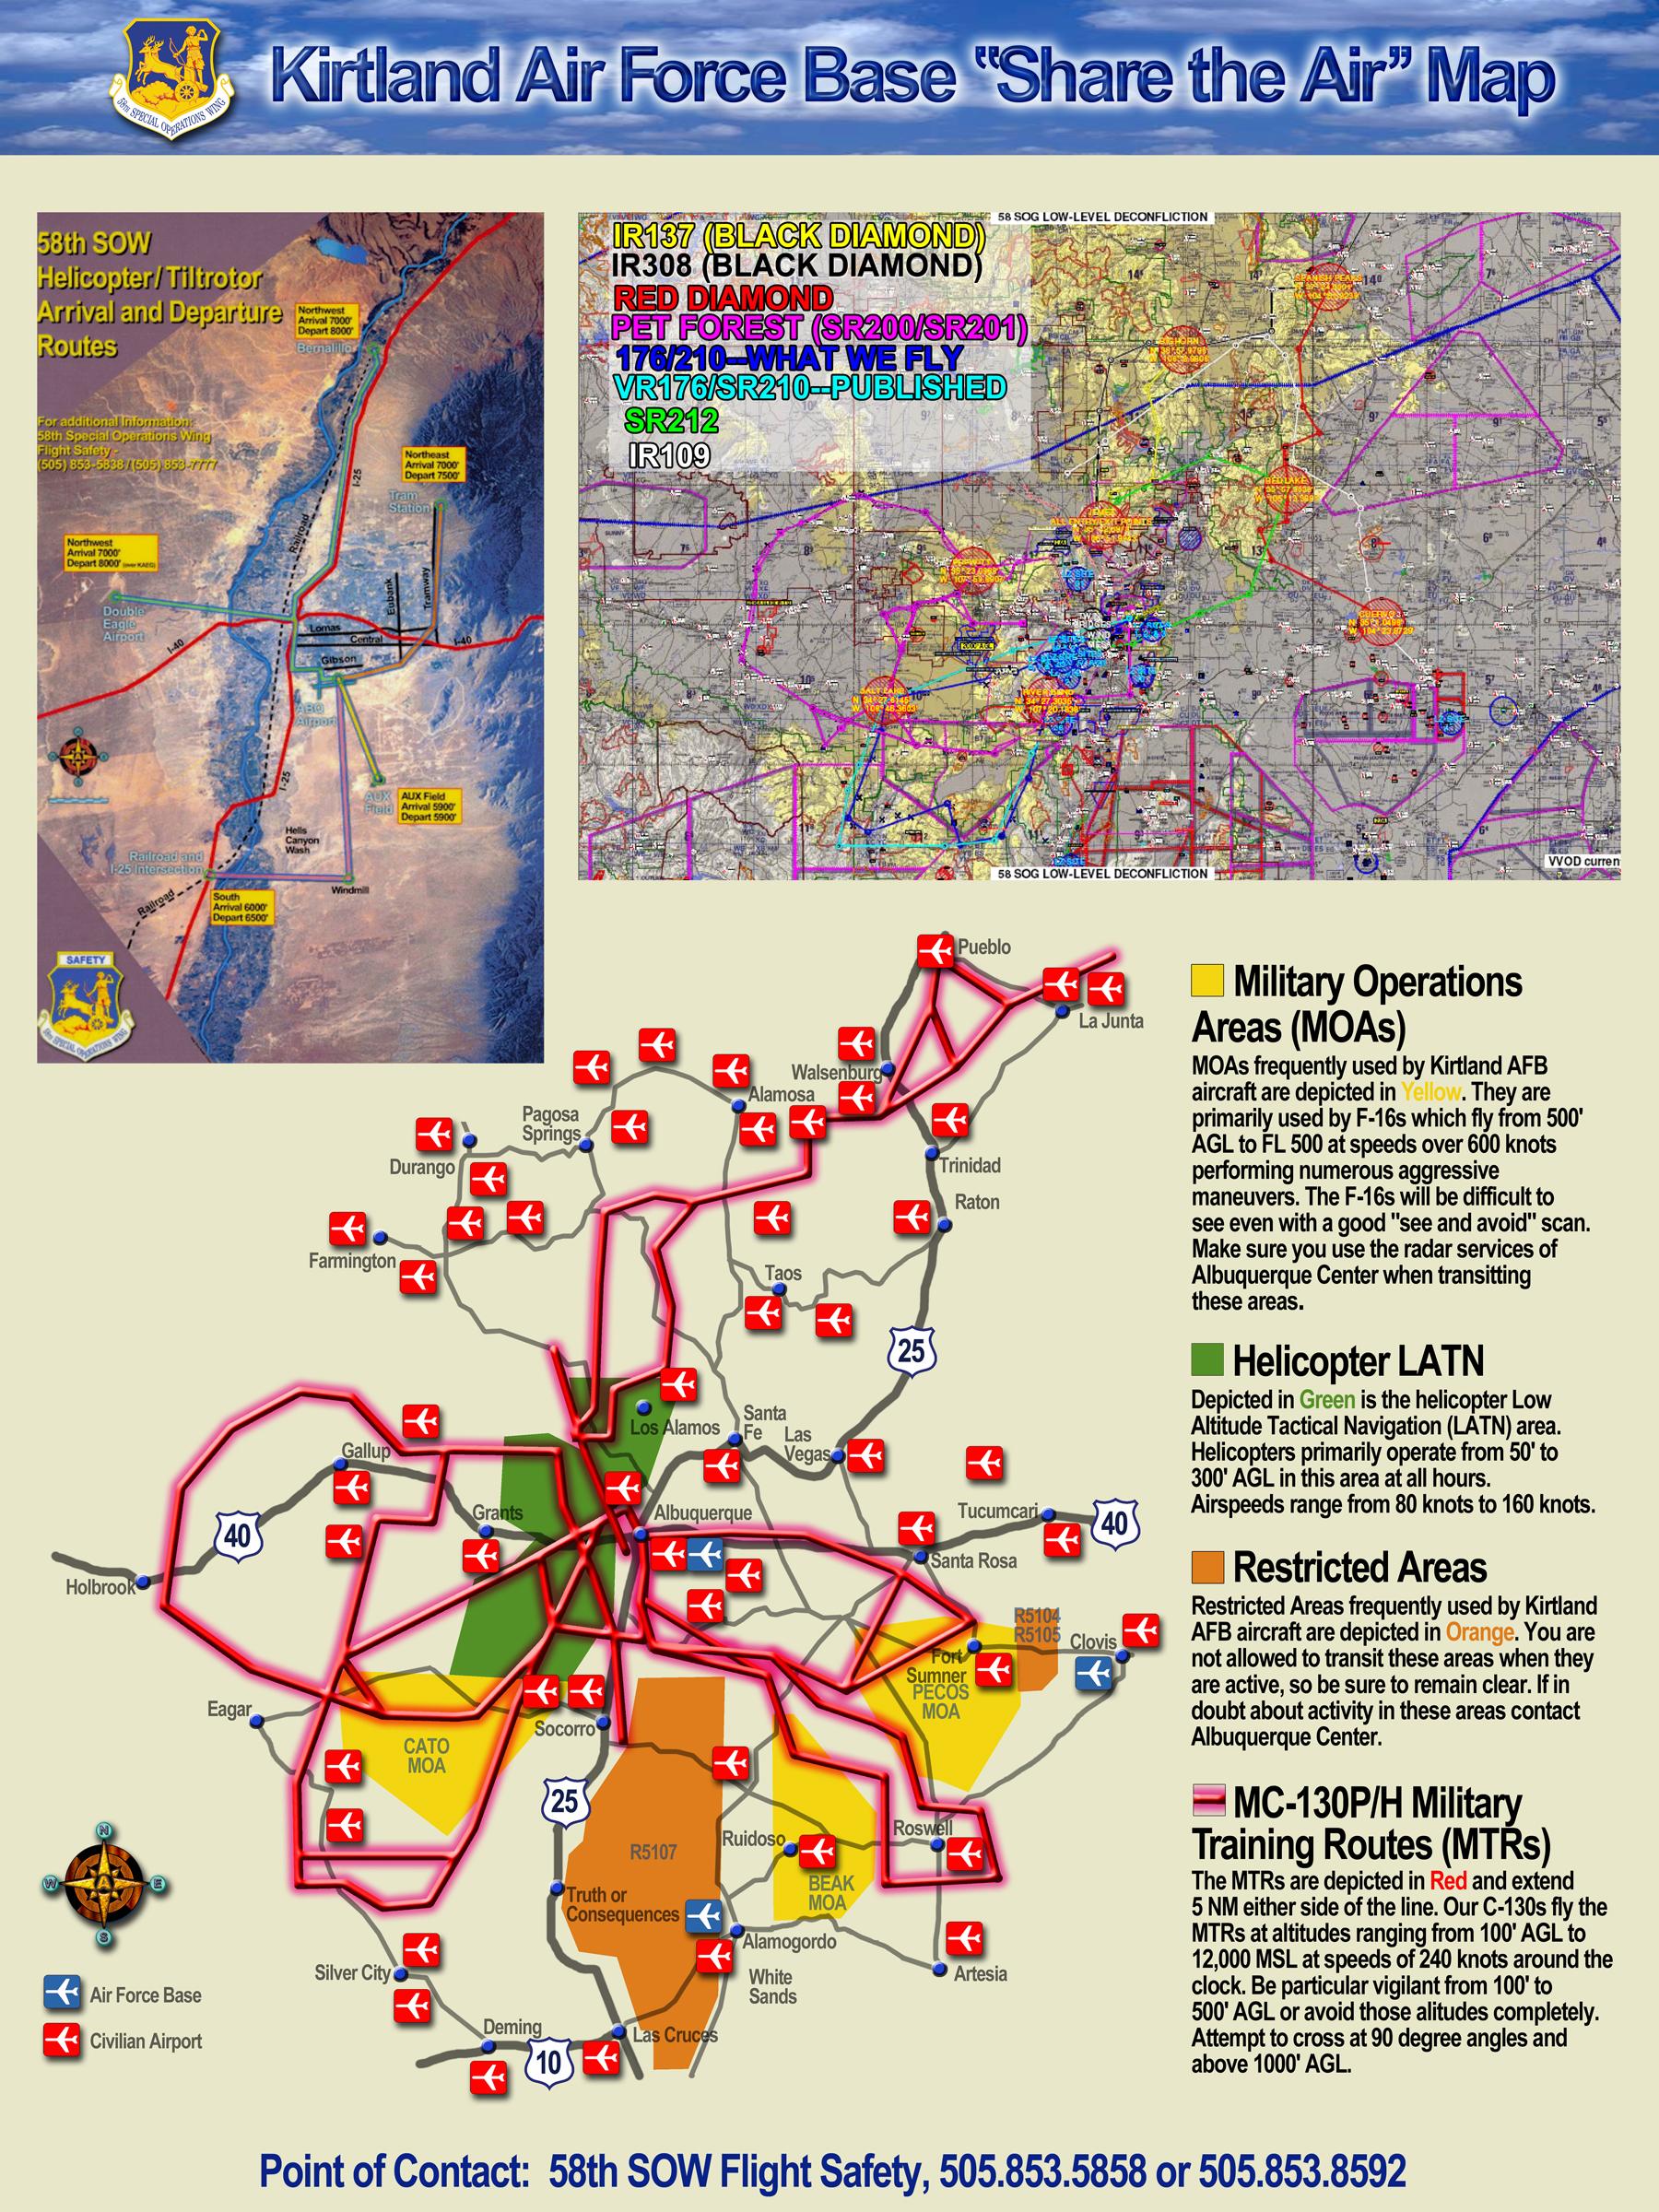 1974 Pontiac Firebird Wiring Pdf Diagram Schematic Map Of Kirtland Afb Gallery Writing Sample Ideas 1979